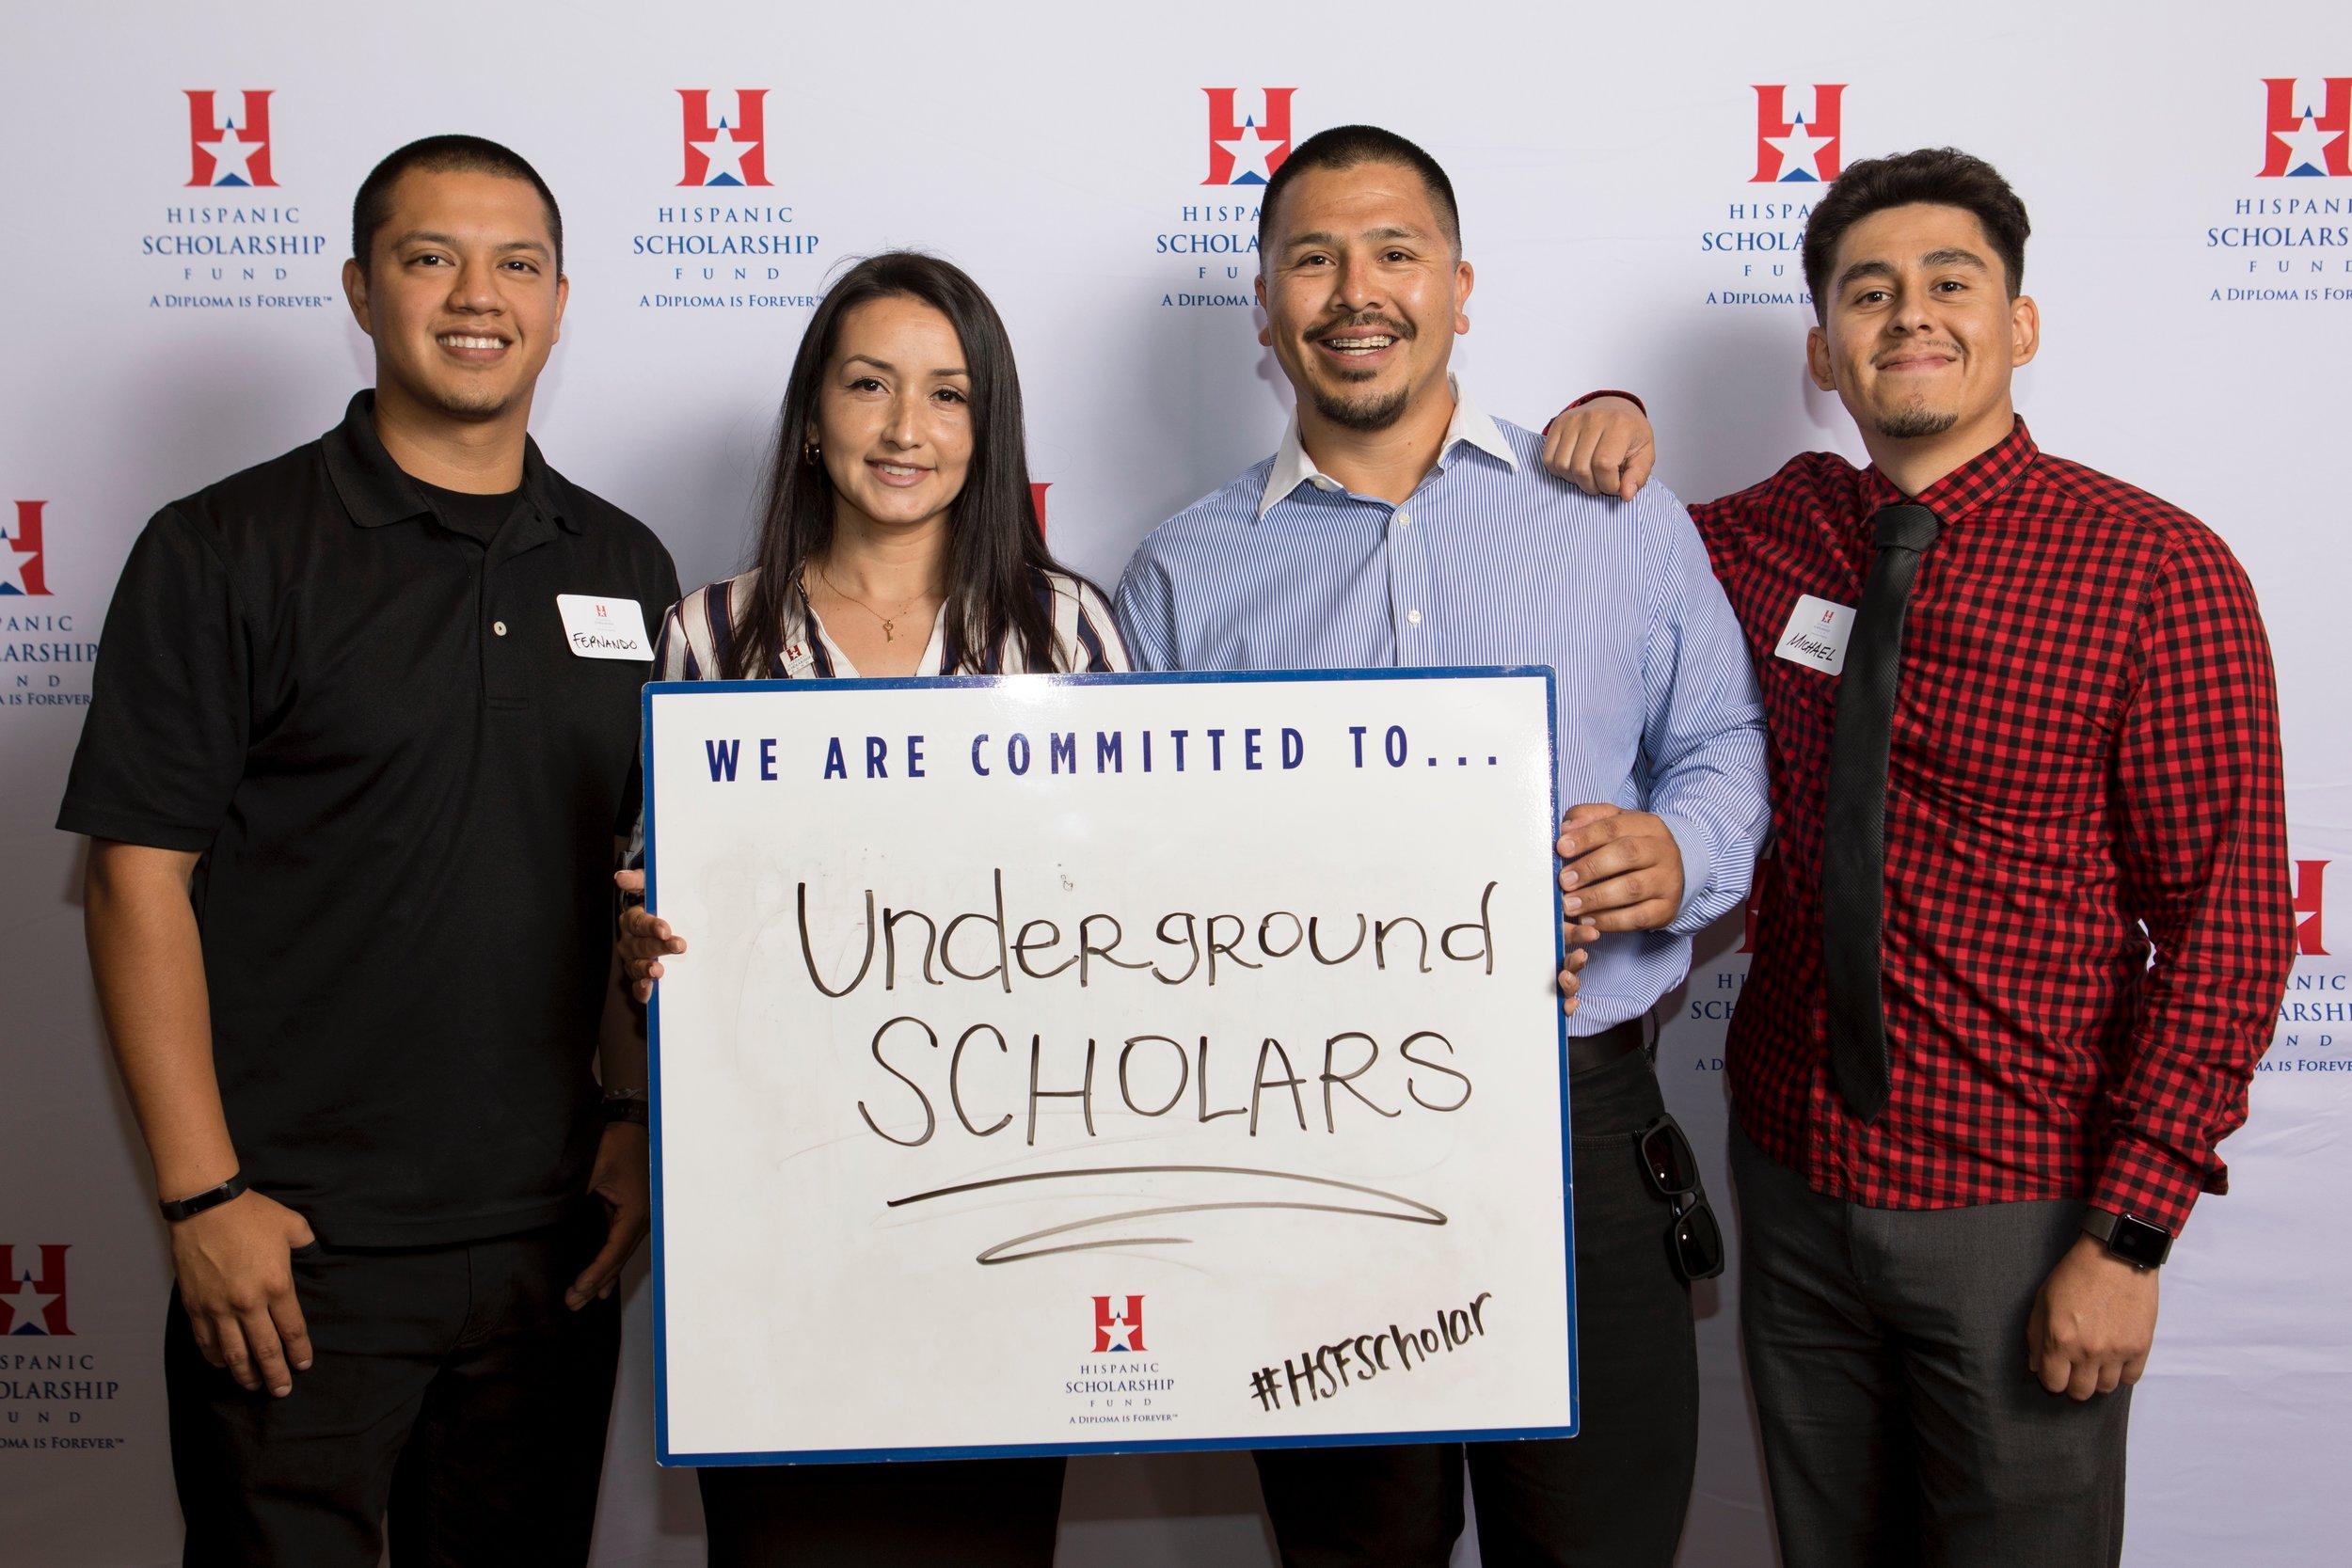 BUS_Hispanic_Scholarship_Fund.jpg